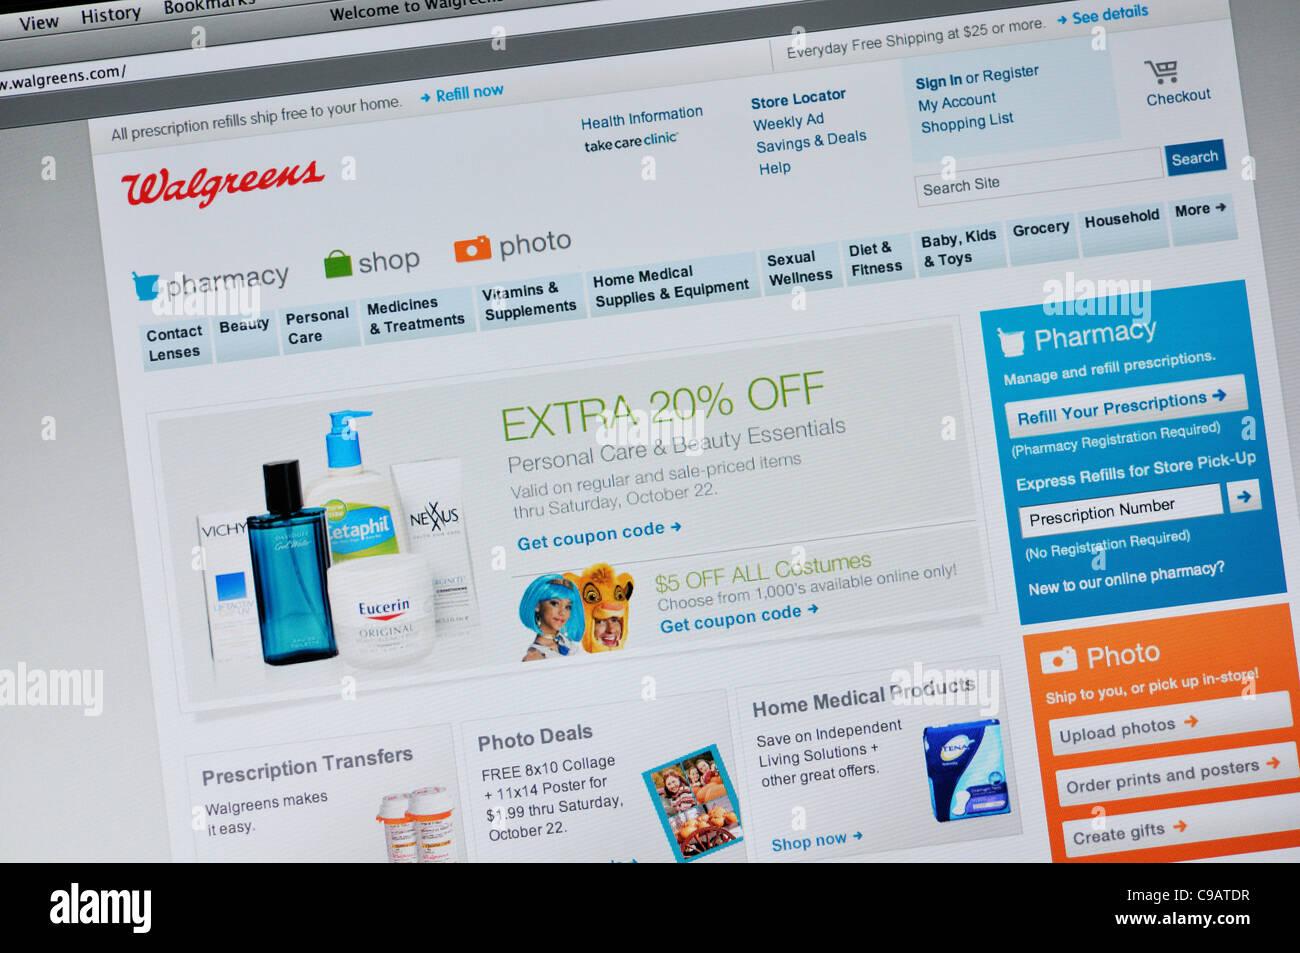 Walgreens Drugstore Stock Photos & Walgreens Drugstore Stock Images ...